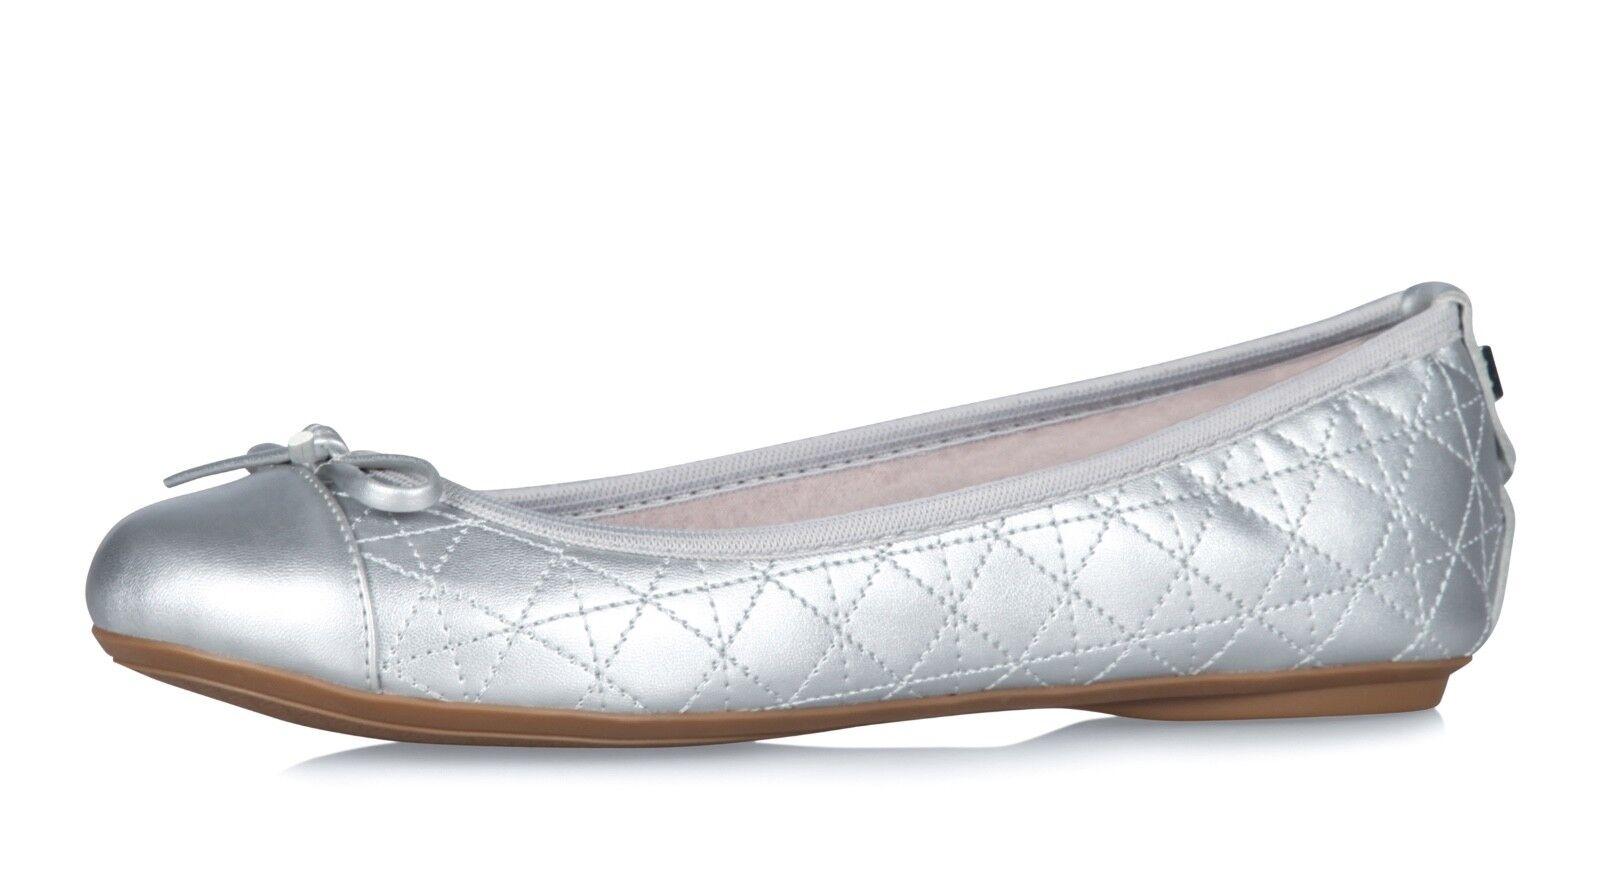 27a878ea43f4e Twists NEW Olivia silver metallic ballet flat shoes sizes 4-8 ...